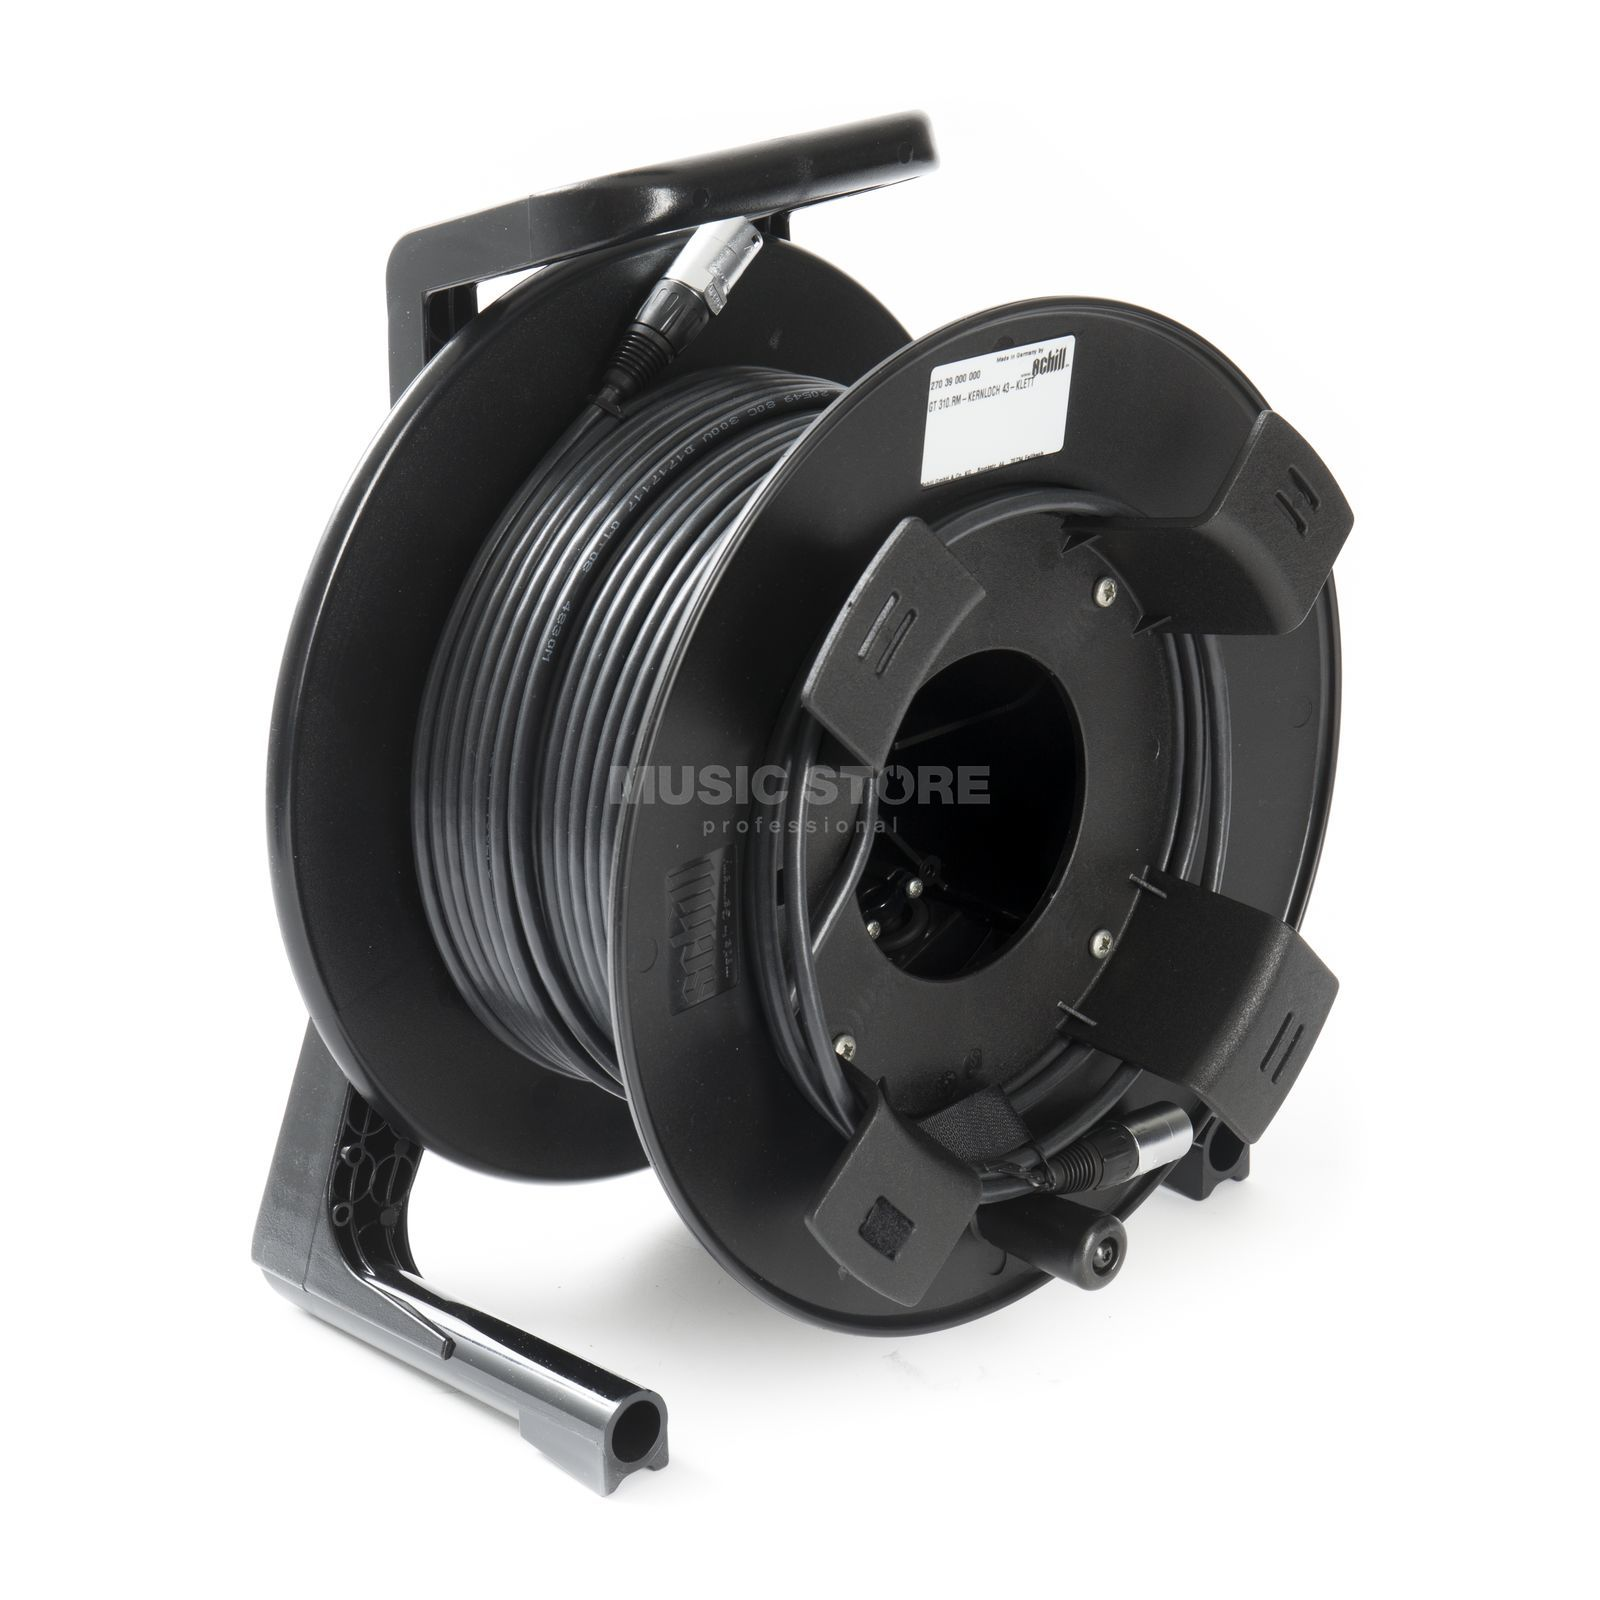 music store cat 5 kabel ethercon 50m auf trommel rj45 neutrik. Black Bedroom Furniture Sets. Home Design Ideas